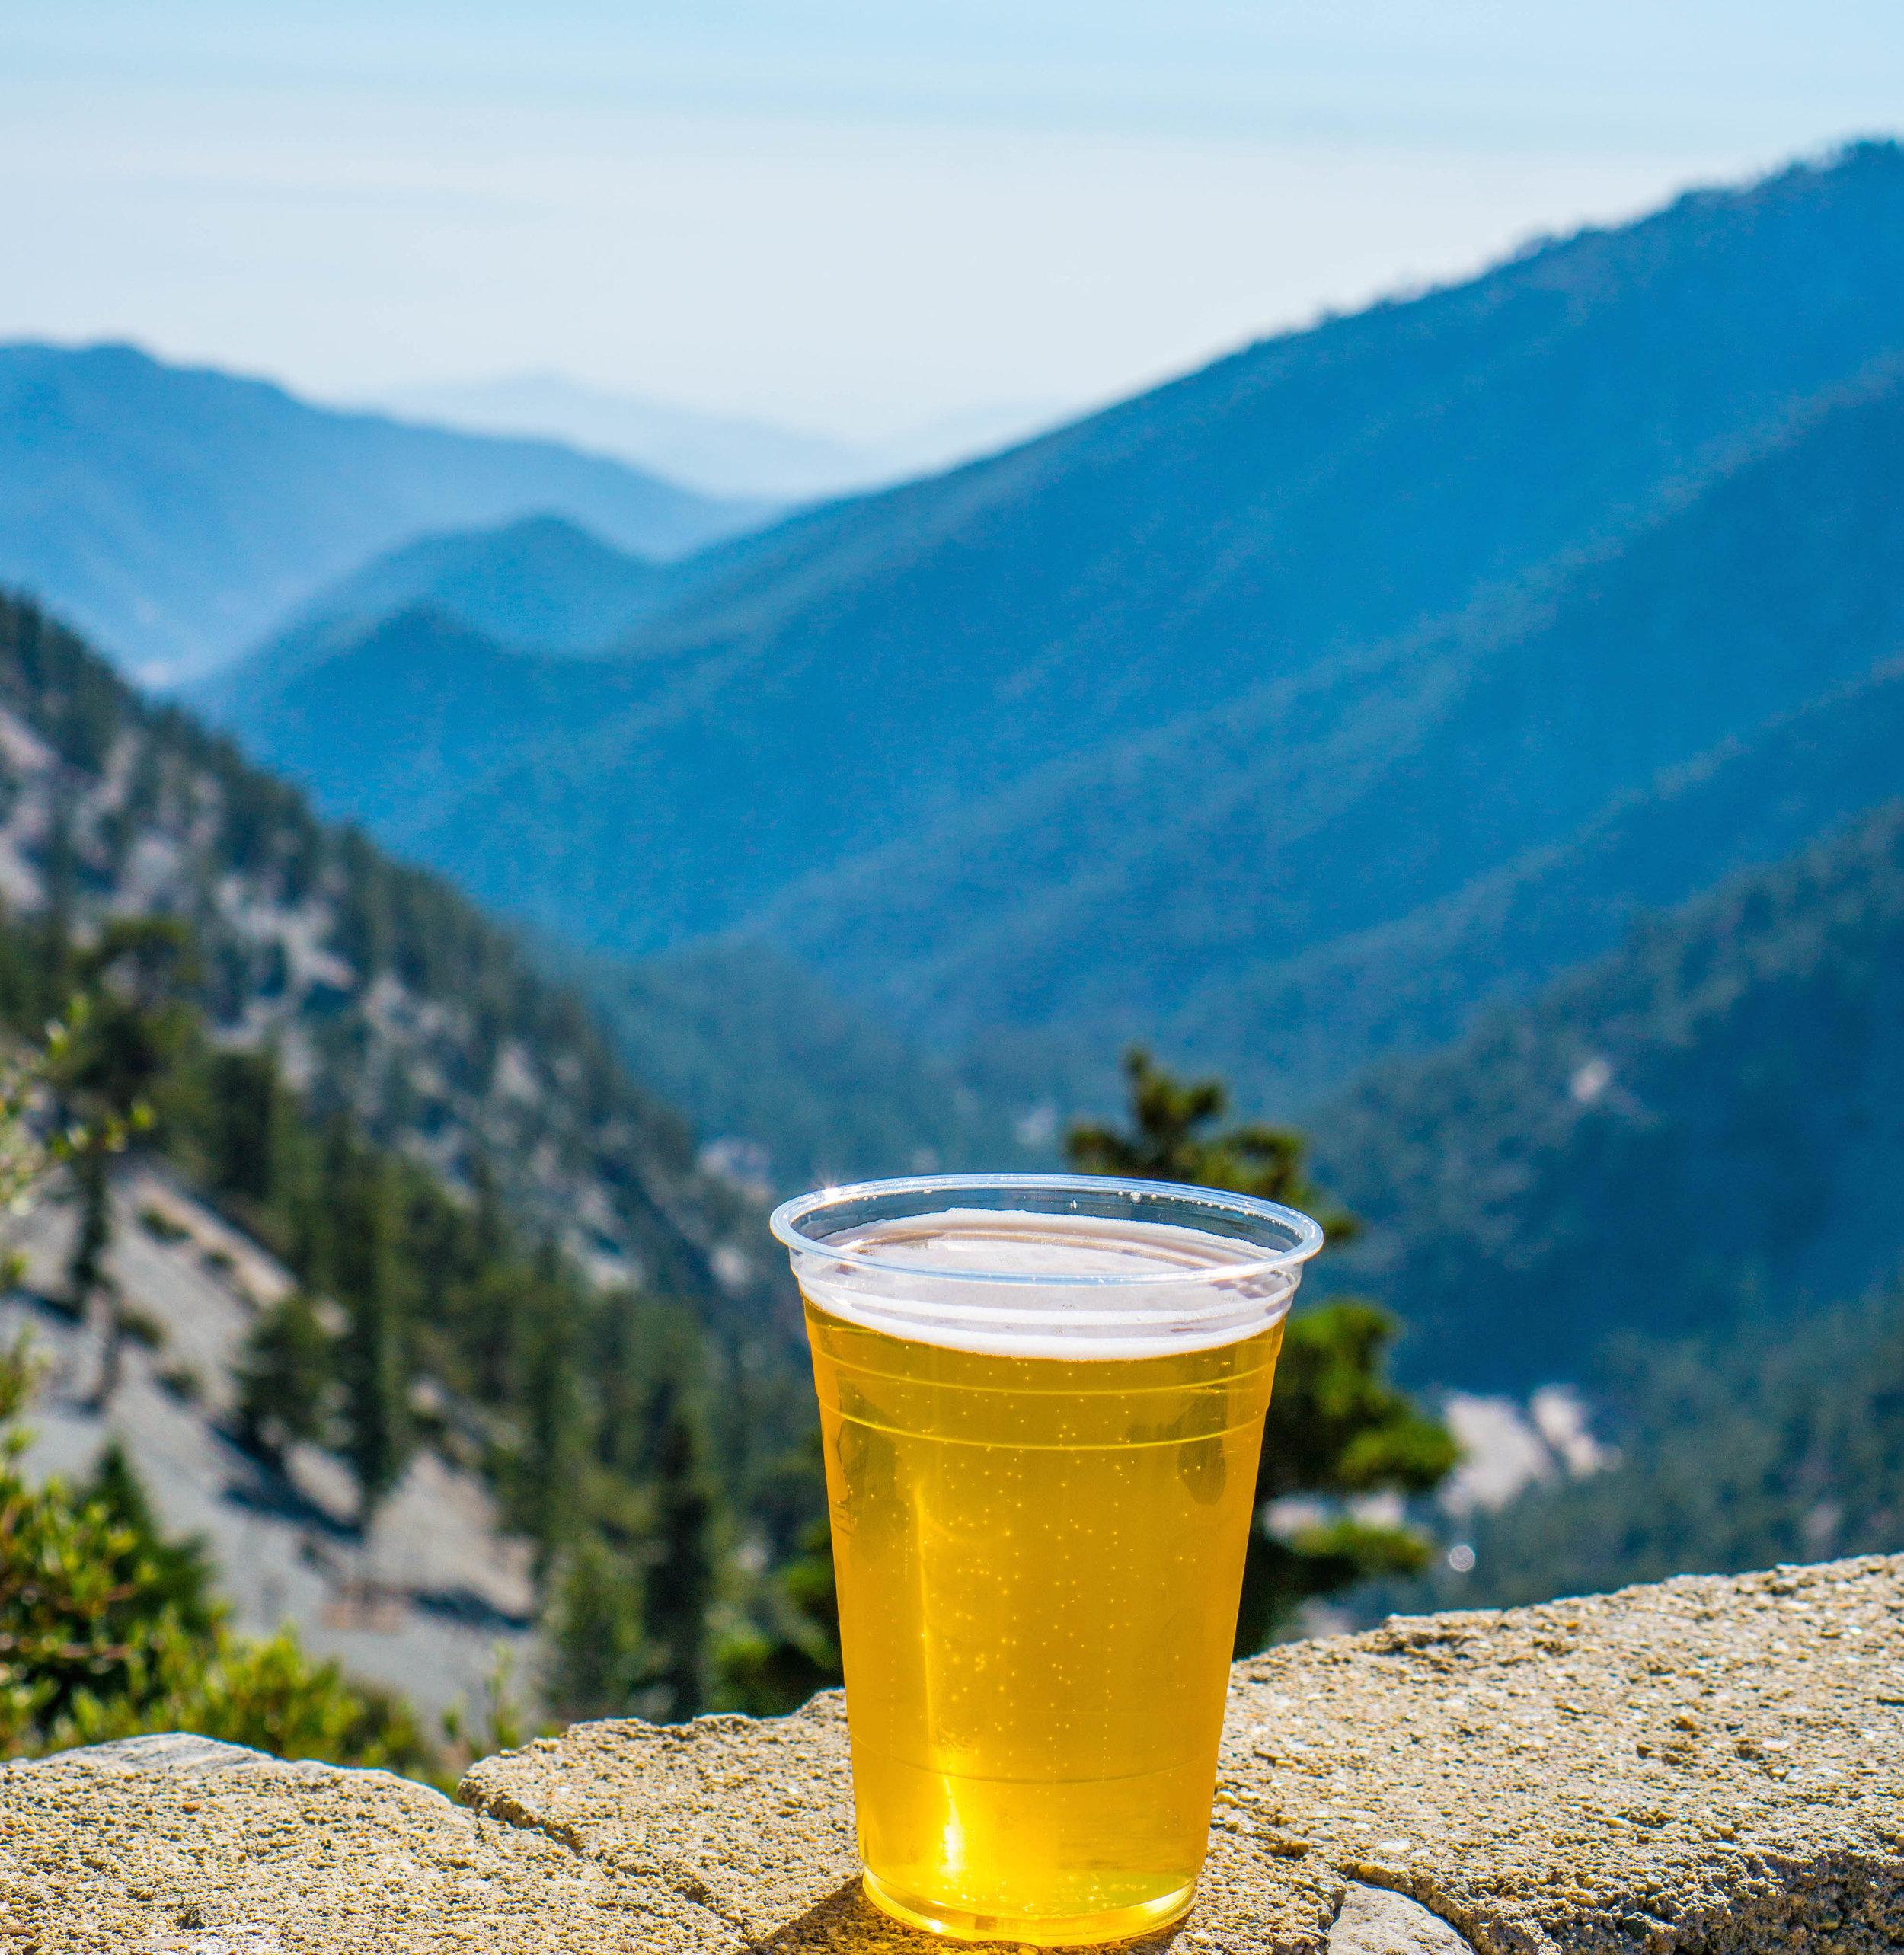 Top-of-the-notch-beer.jpg